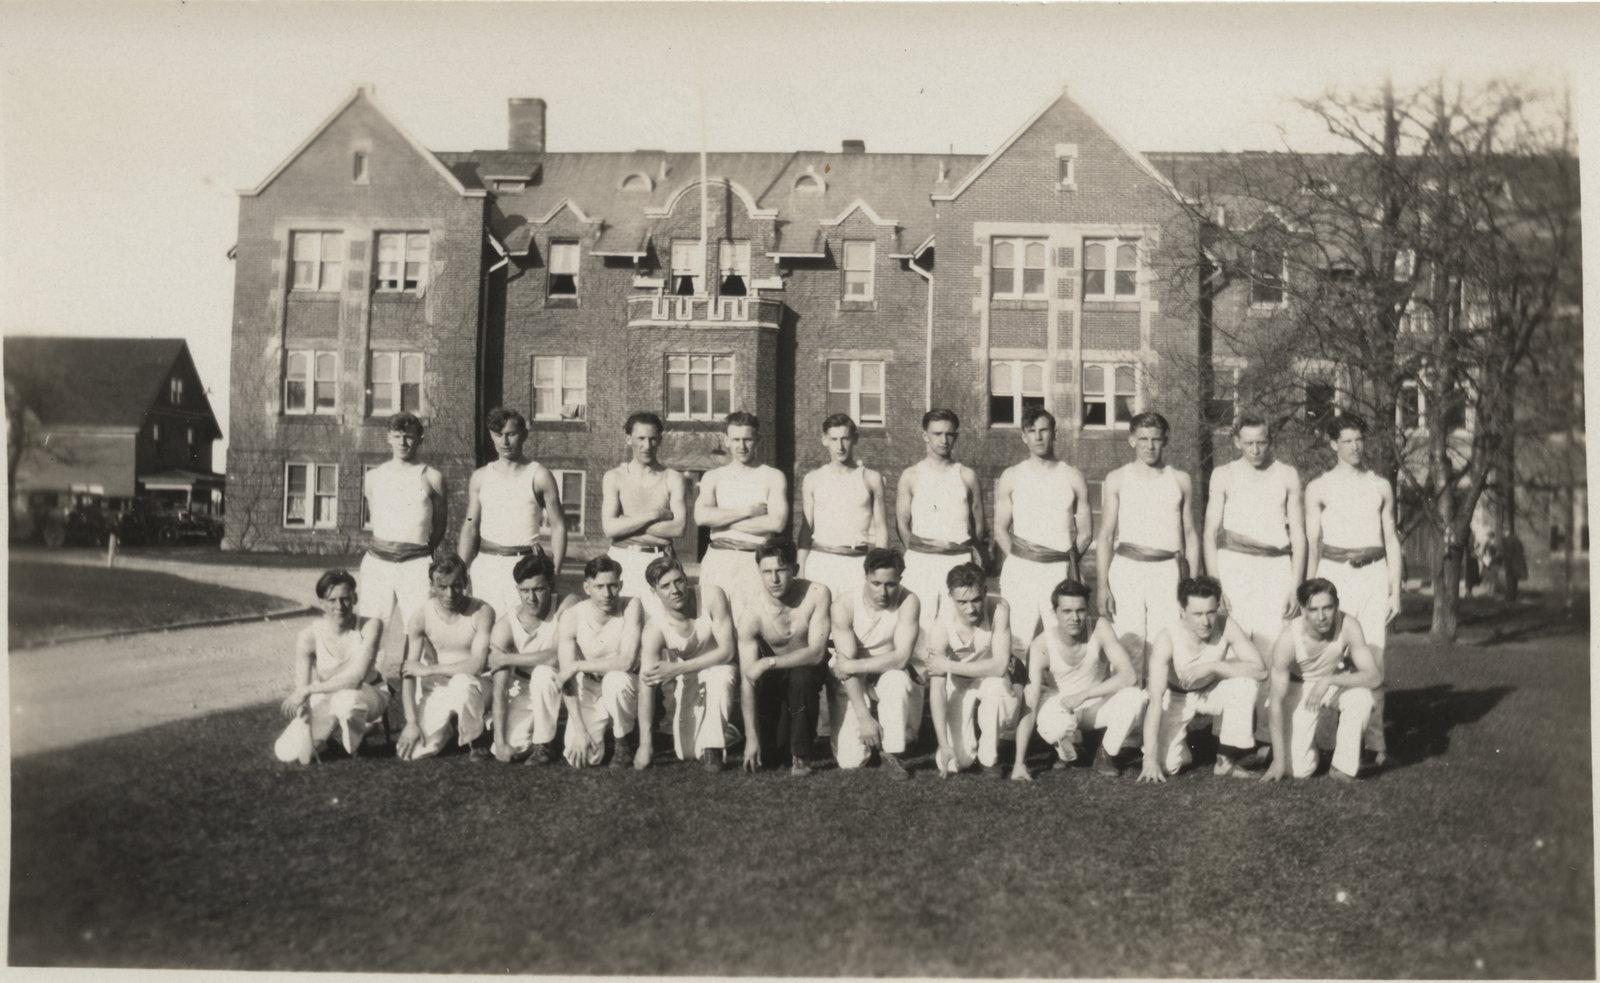 Waterloo College pyramid team, 1932